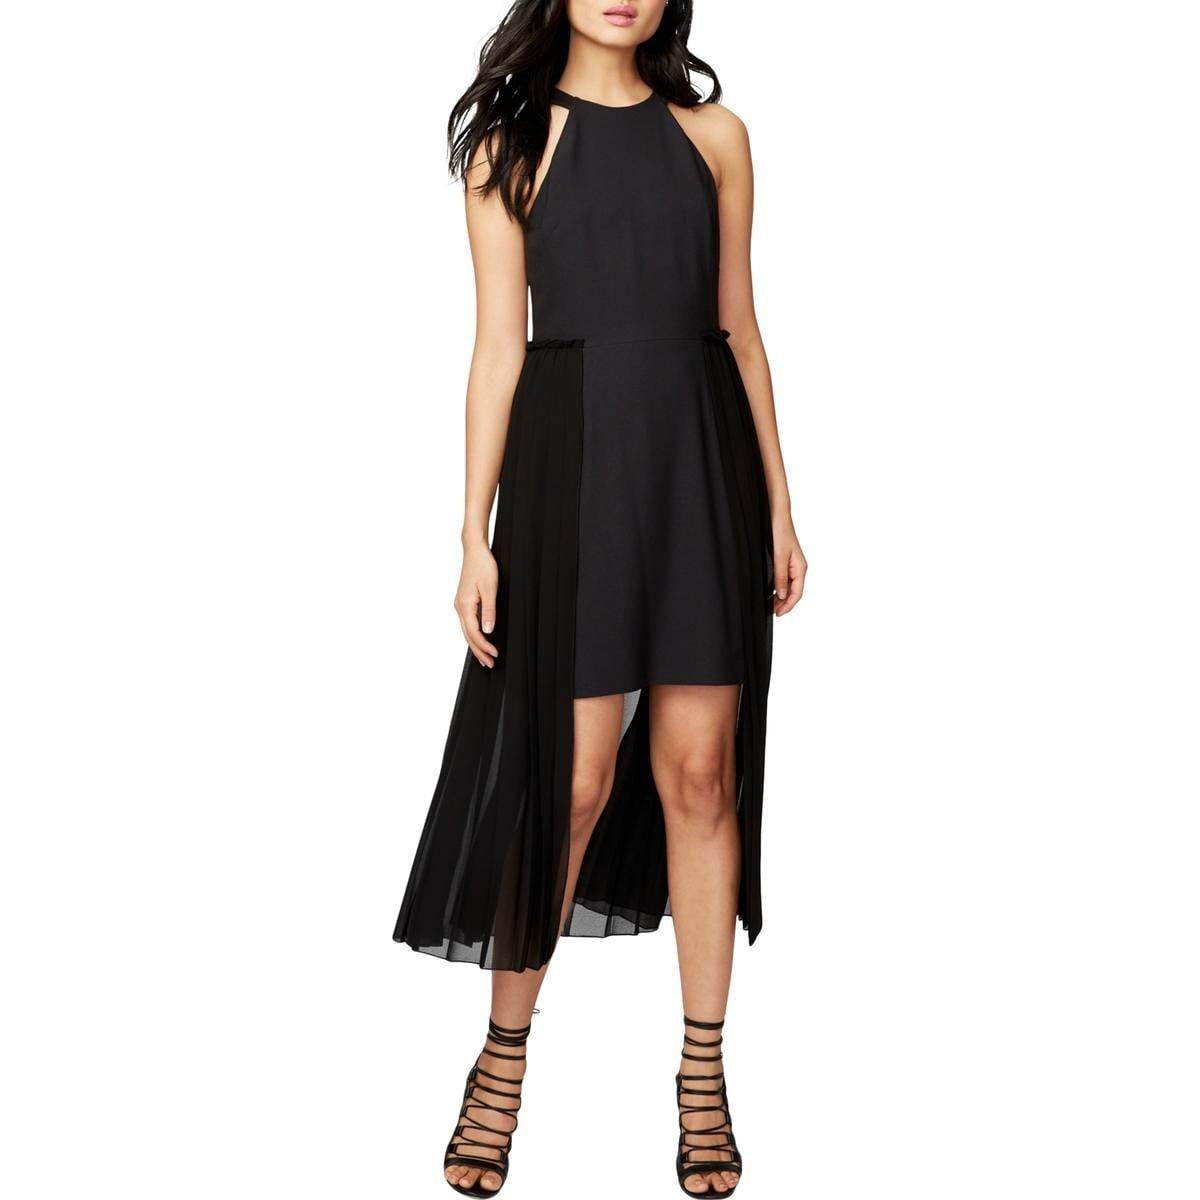 319e888076a Shop Rachel Rachel Roy Womens Party Dress Pleated Chiffon Overlay ...